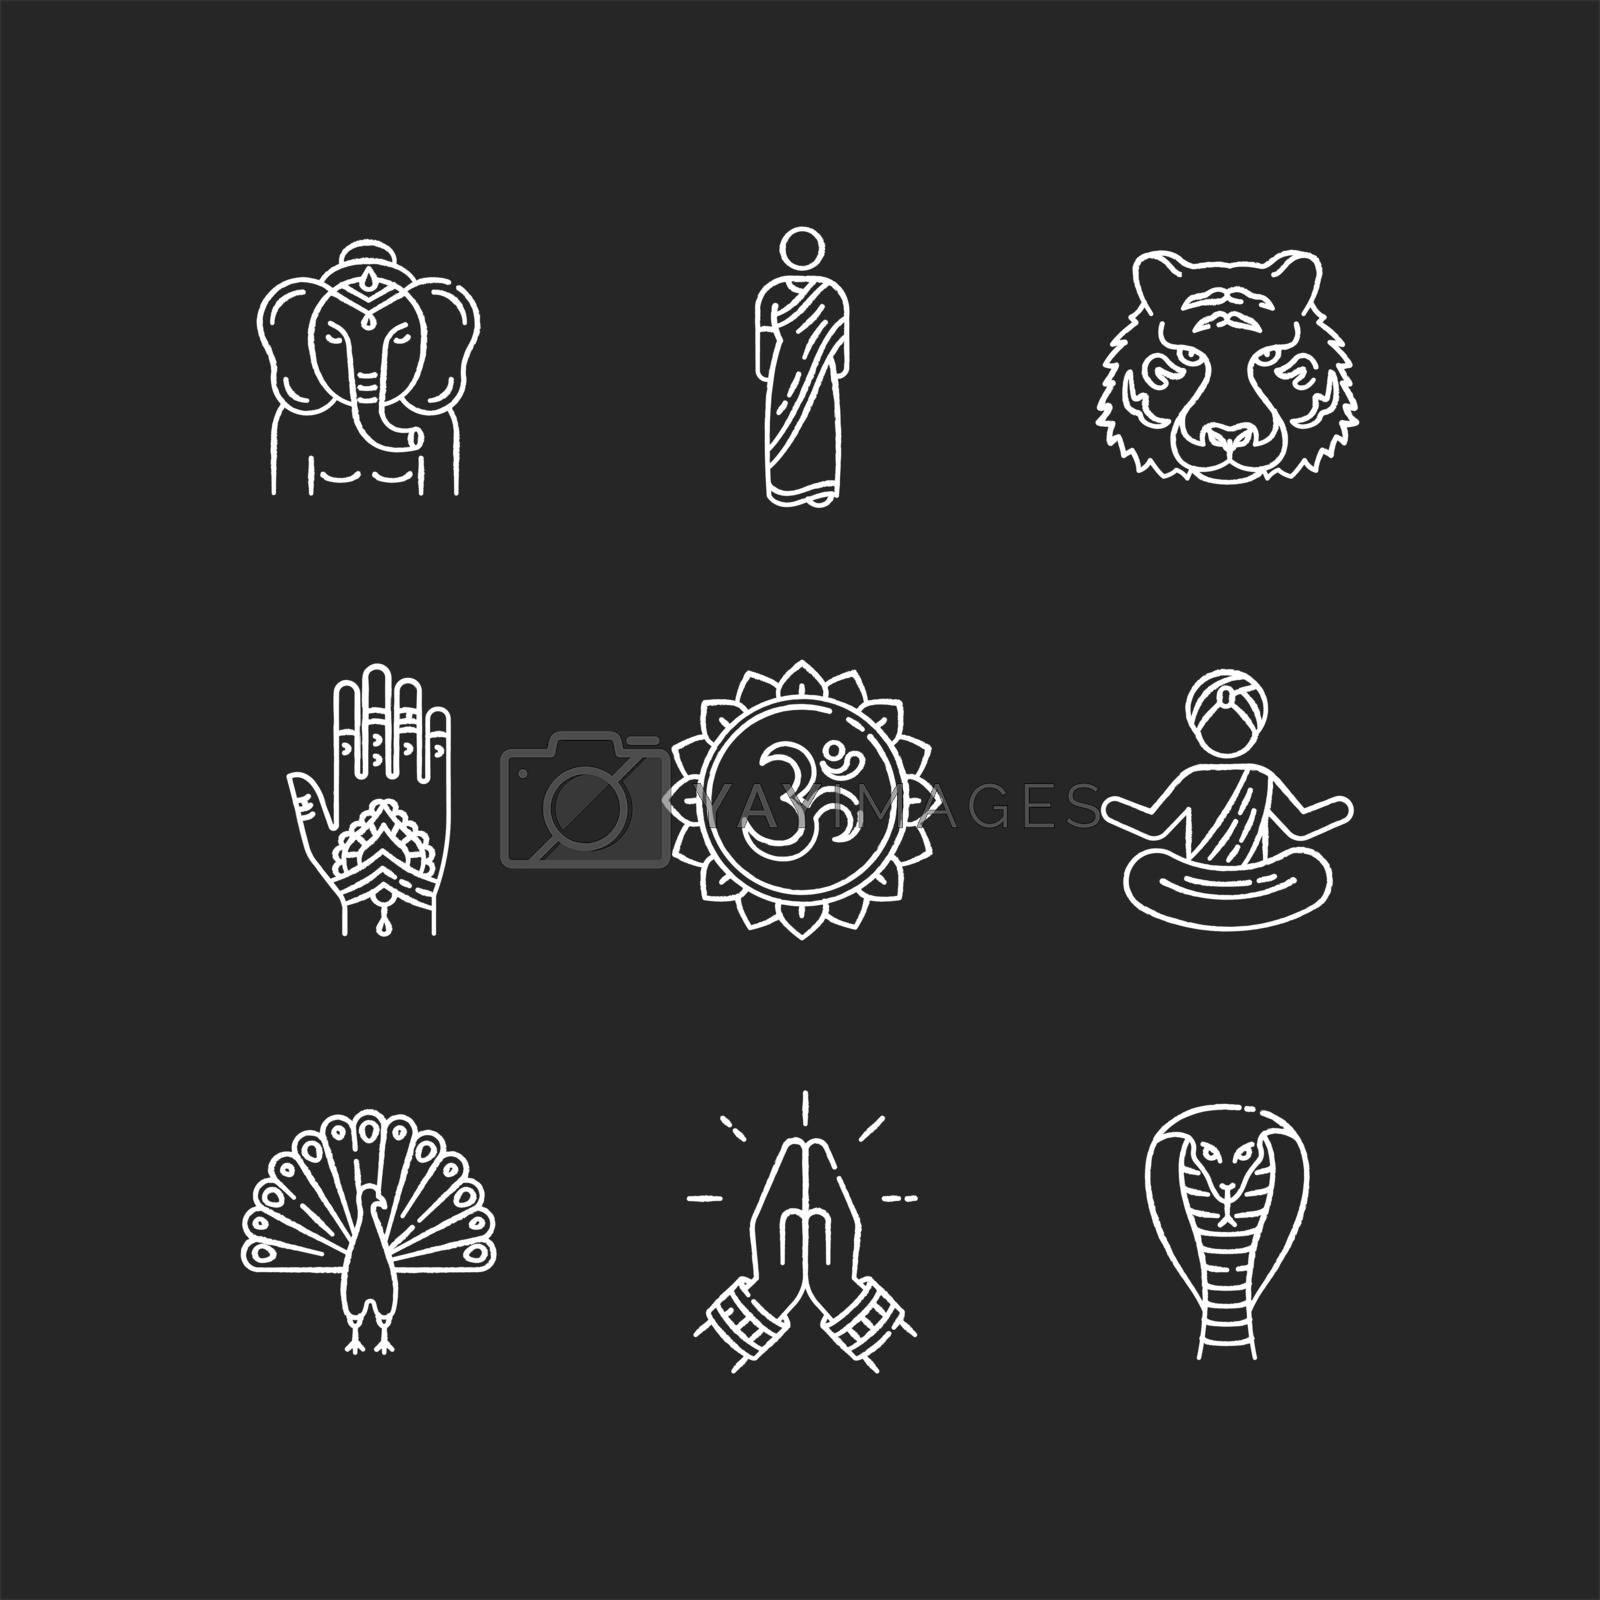 Indian spiritual symbols chalk white icons set on black background. Om sound representation. Yoga practitioner. Namaste gesture. Ganesha. Henna body art. Traditional sari.Isolated vector chalkboard